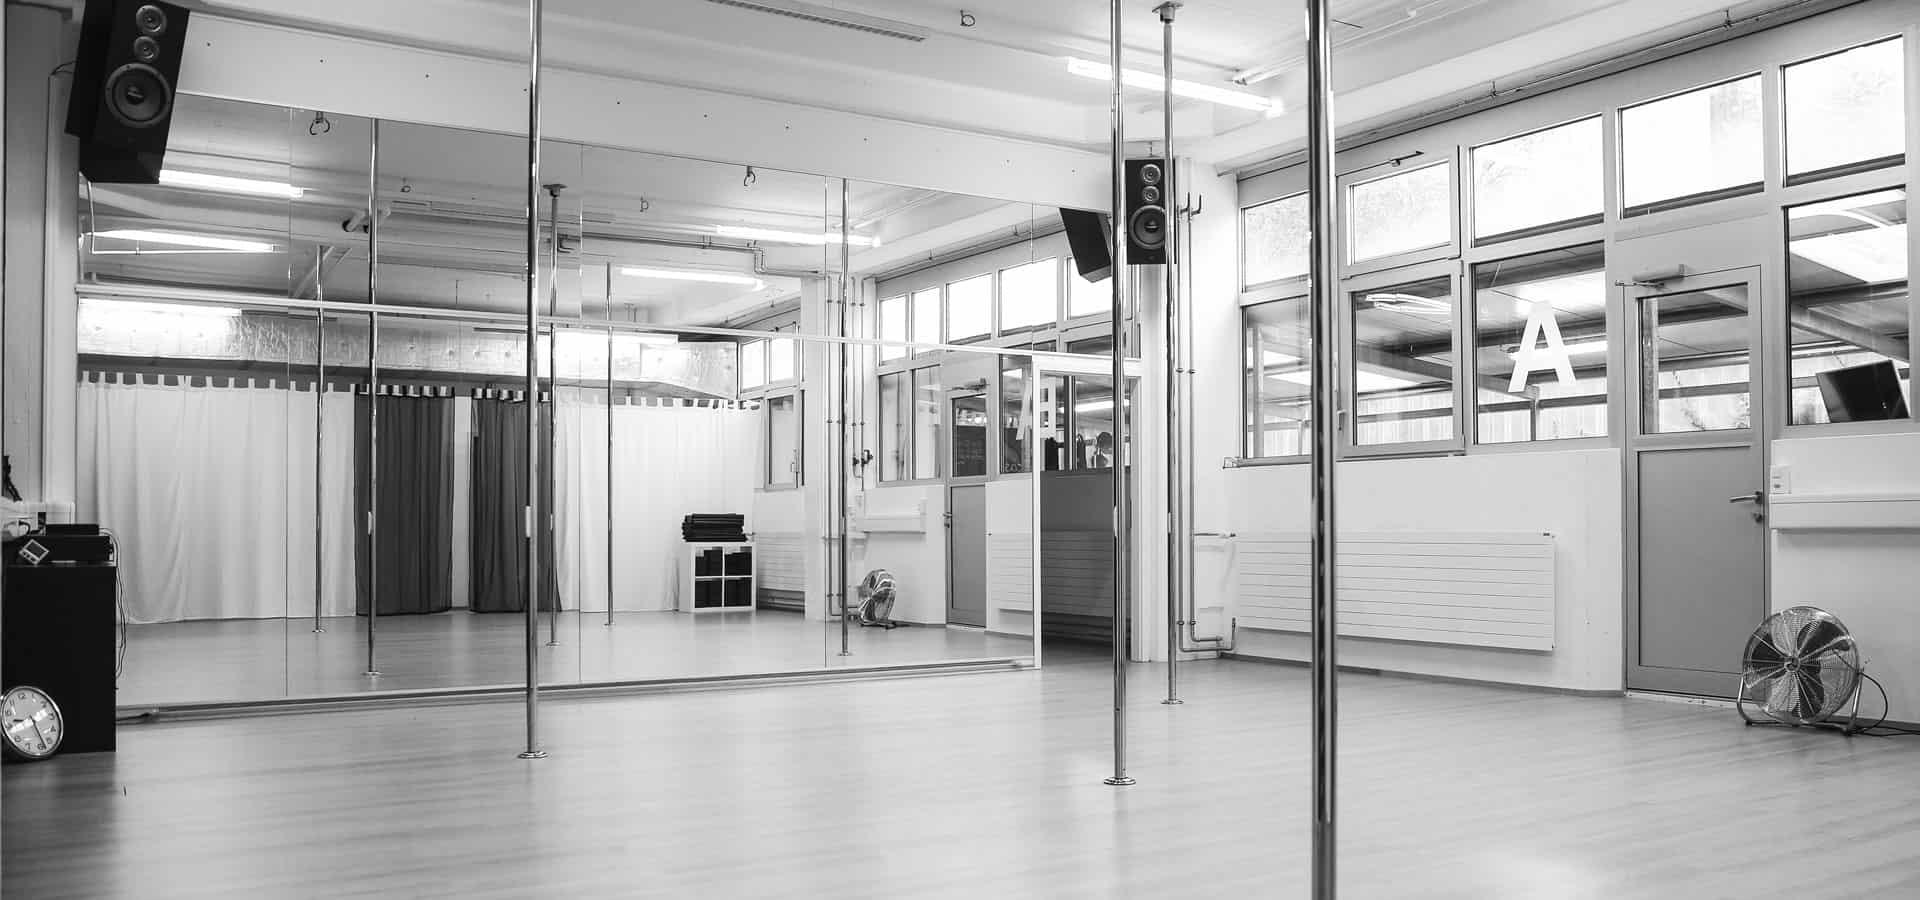 Gravity Arts Studio A